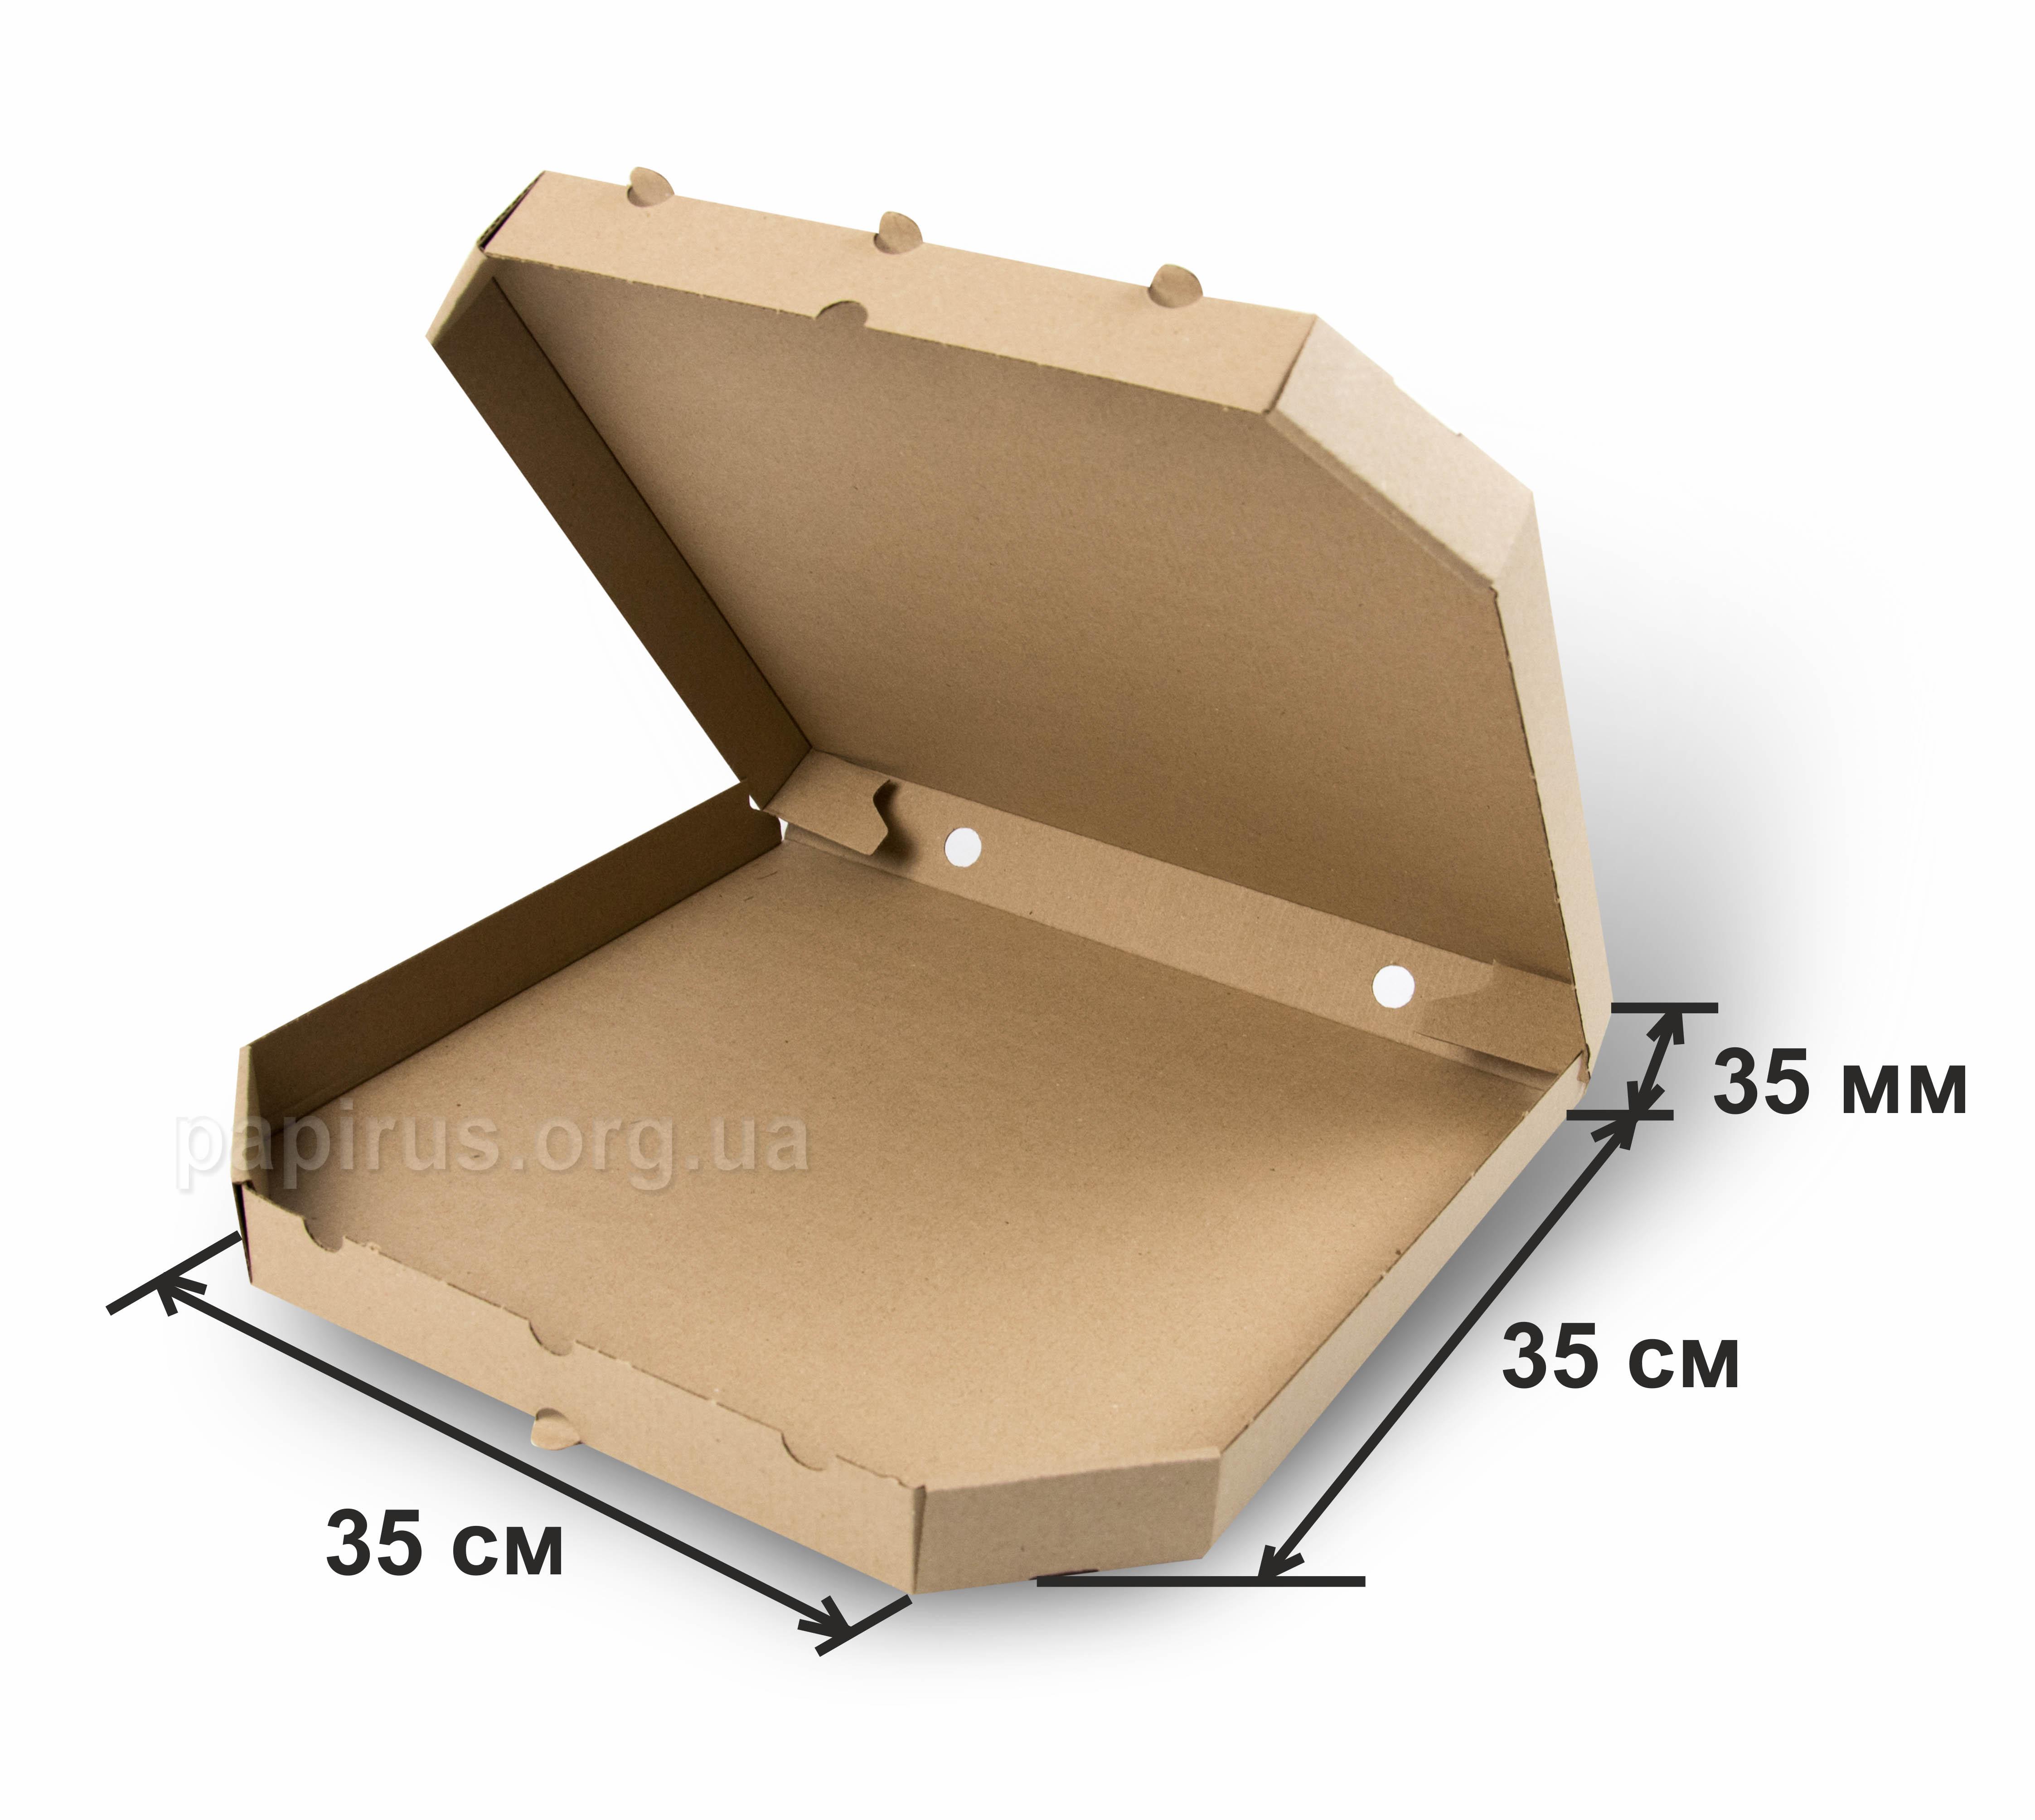 Коробка для пиццы бурая 350х350, г.Сумы, Типография Папирус